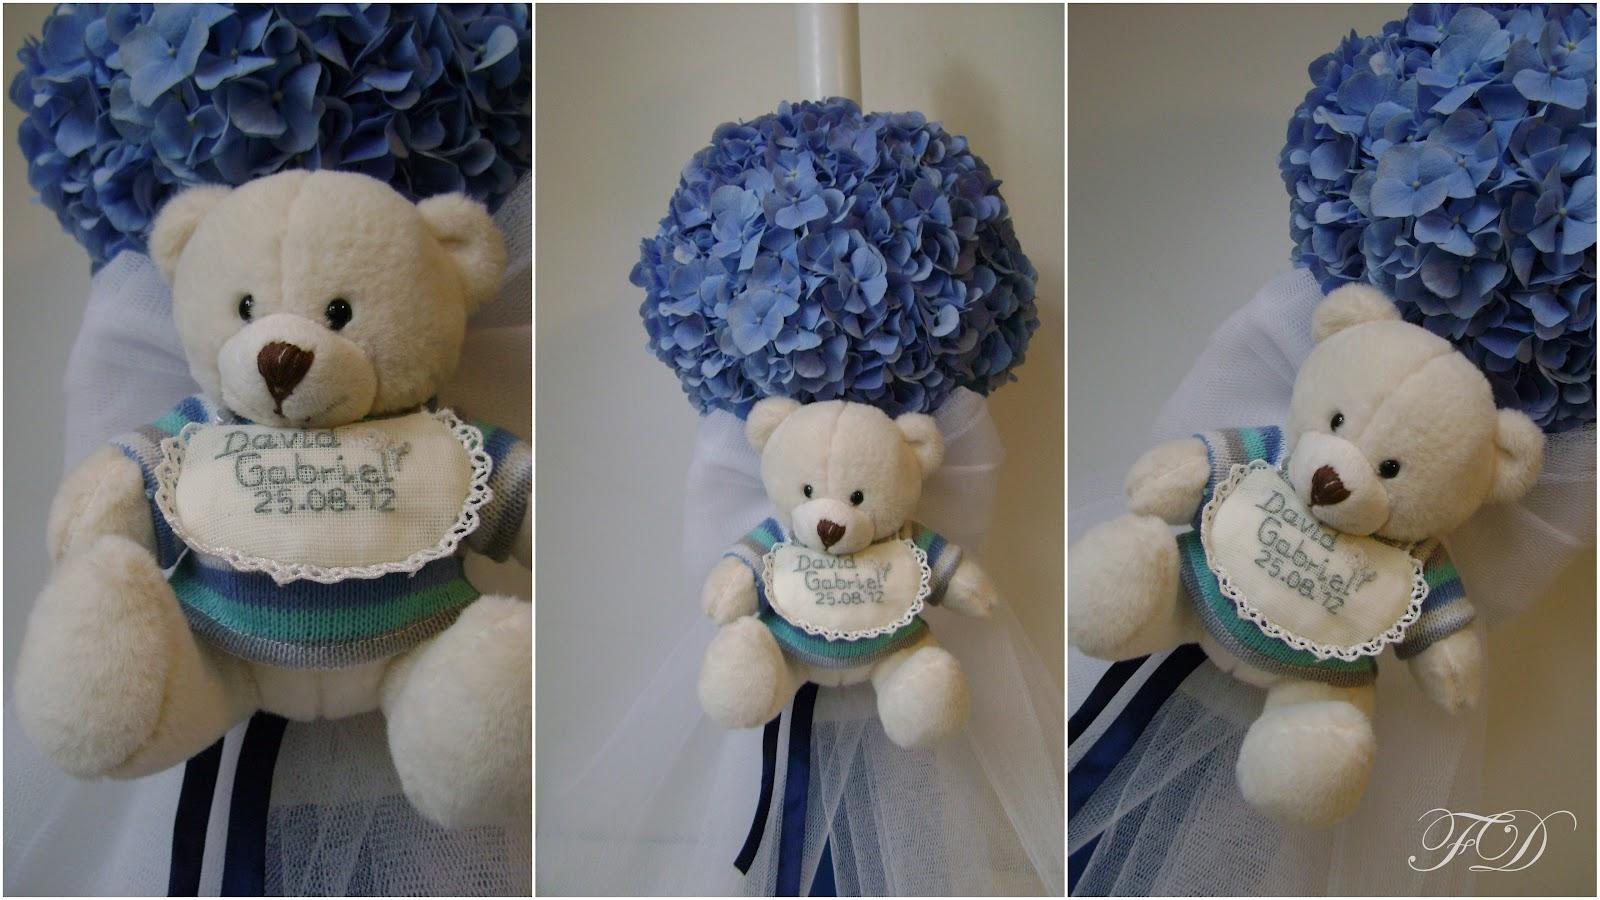 flower decor mini lumanare botez cu hortensie albastra si ursulet alb. Black Bedroom Furniture Sets. Home Design Ideas